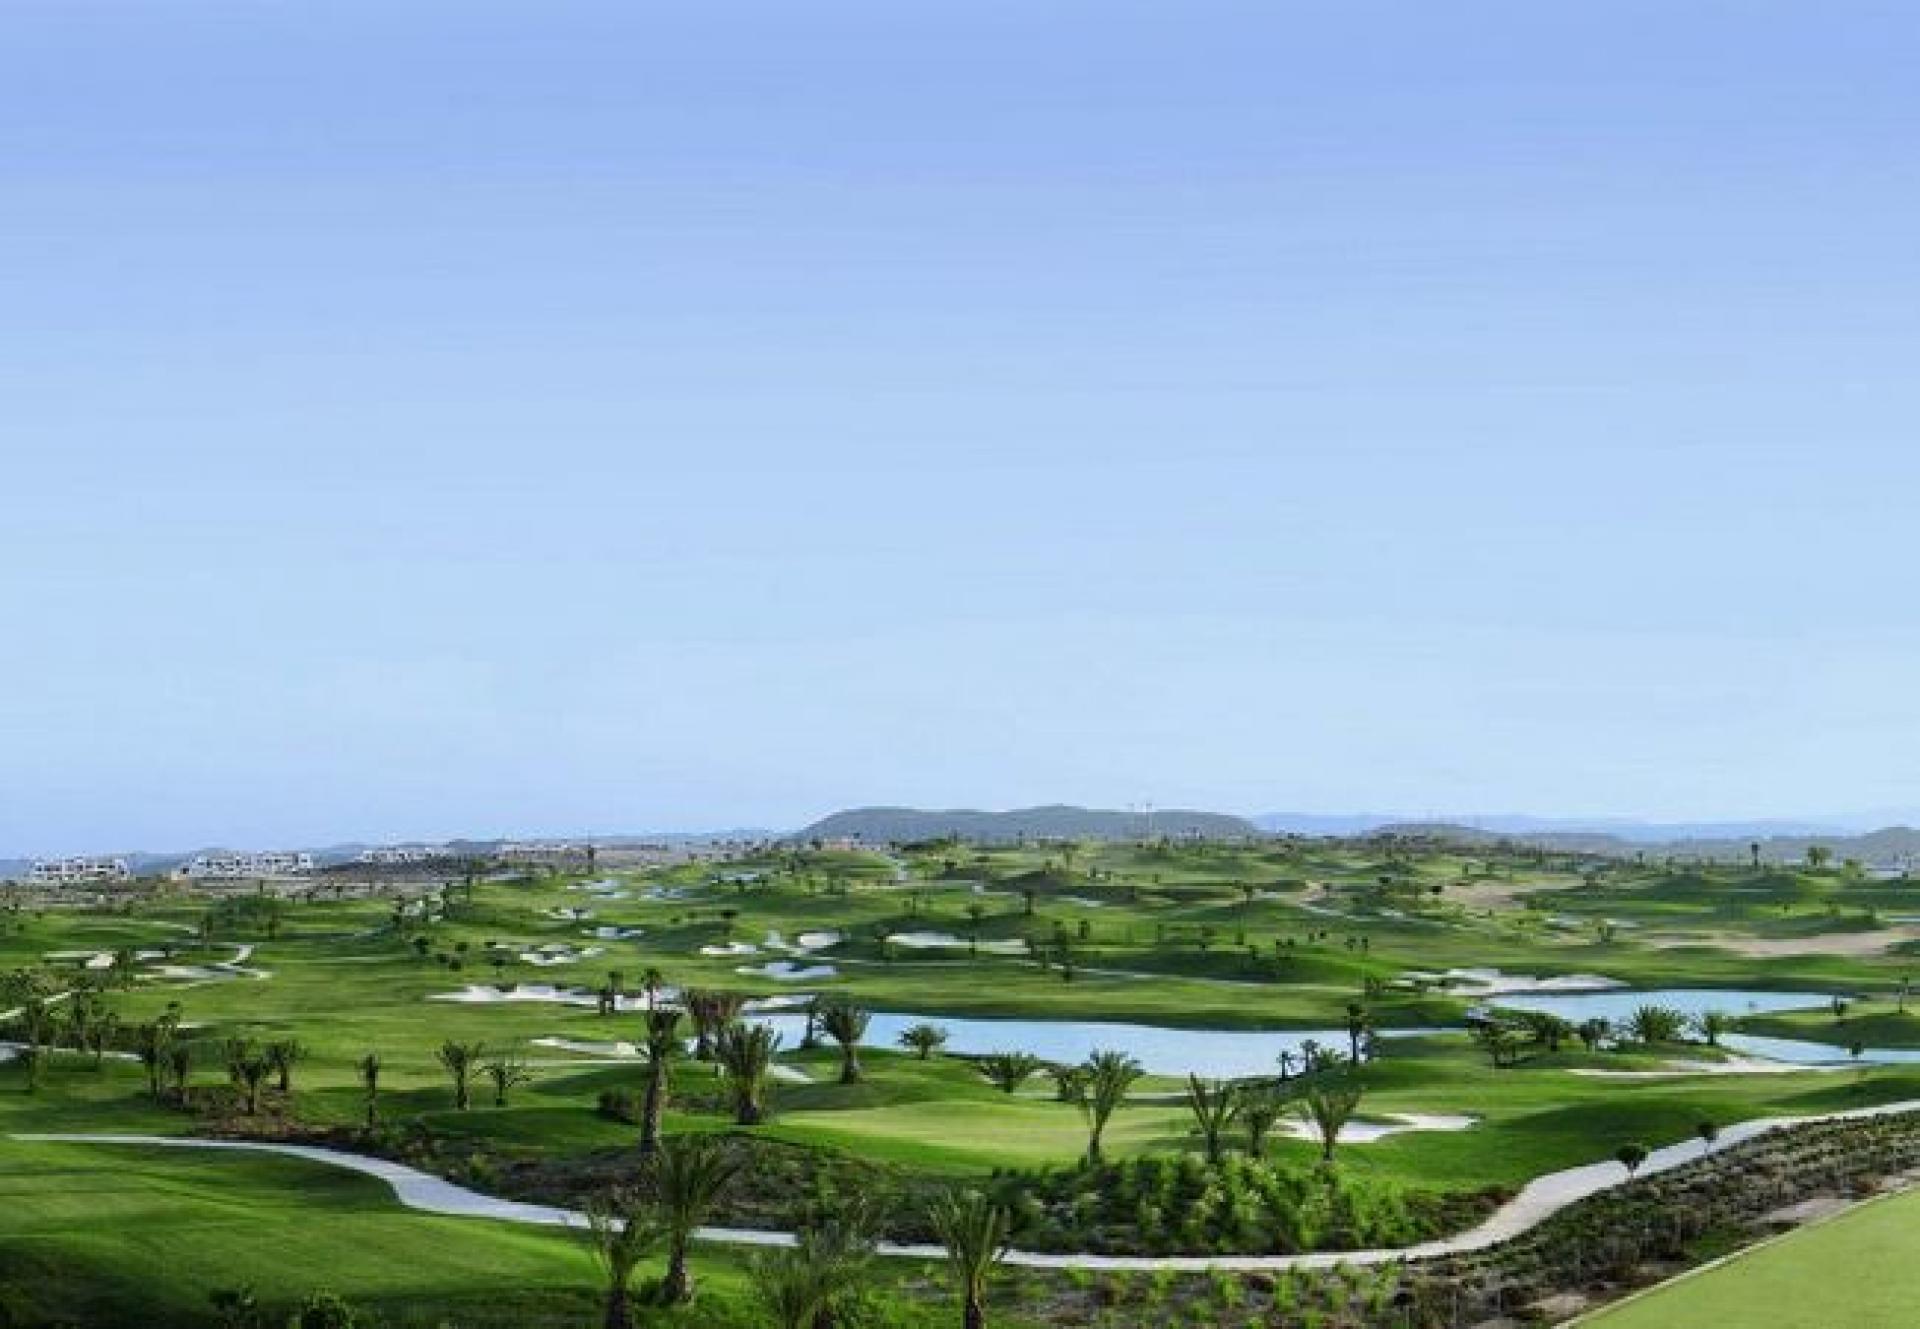 Capri - Vistabella golf resort (Costa Blanca)